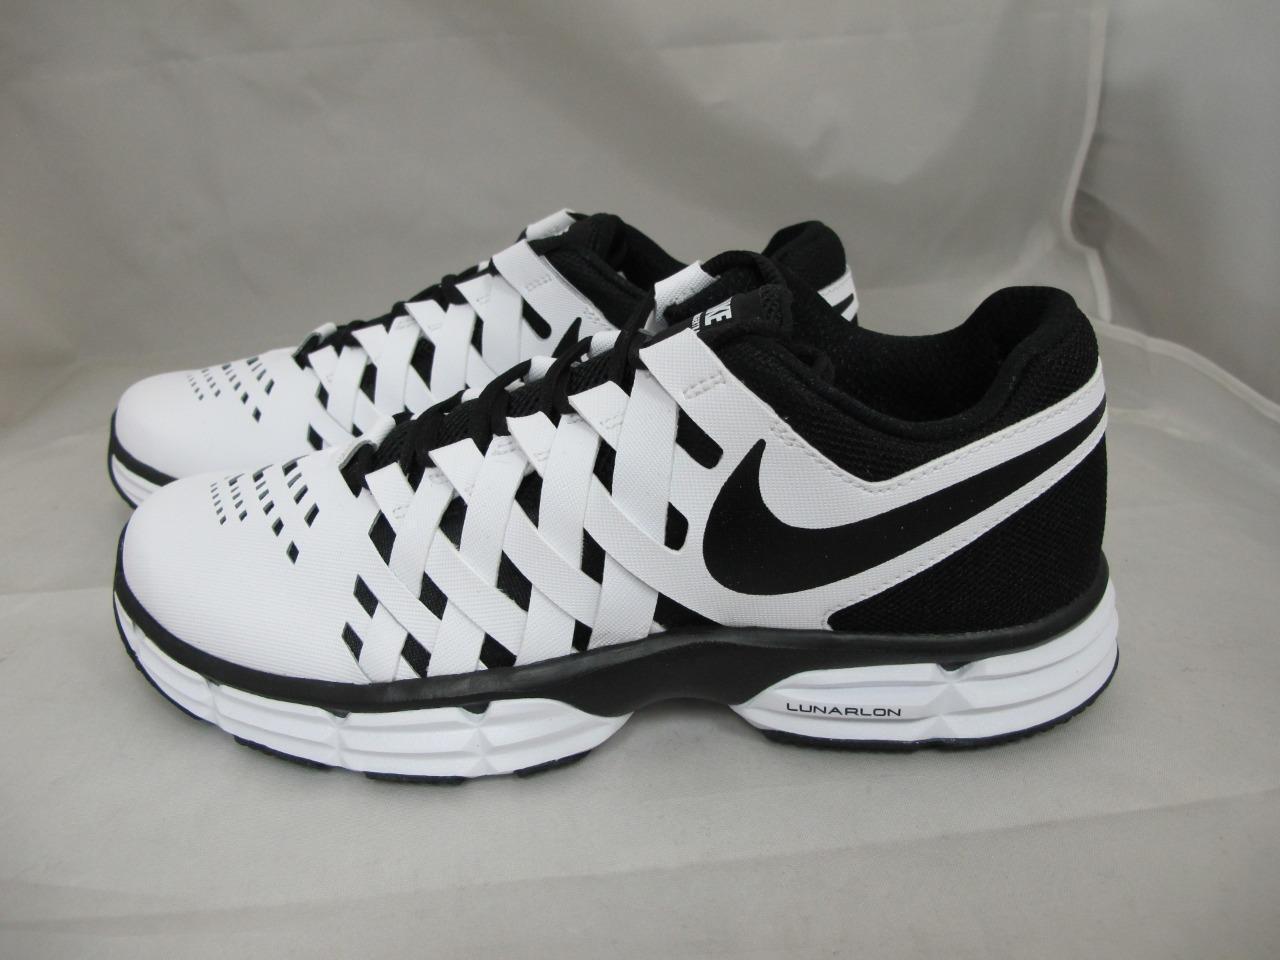 Nuevo para 898066-100 hombre Nike Lunar FINGERTRAP TR 898066-100 para a58358